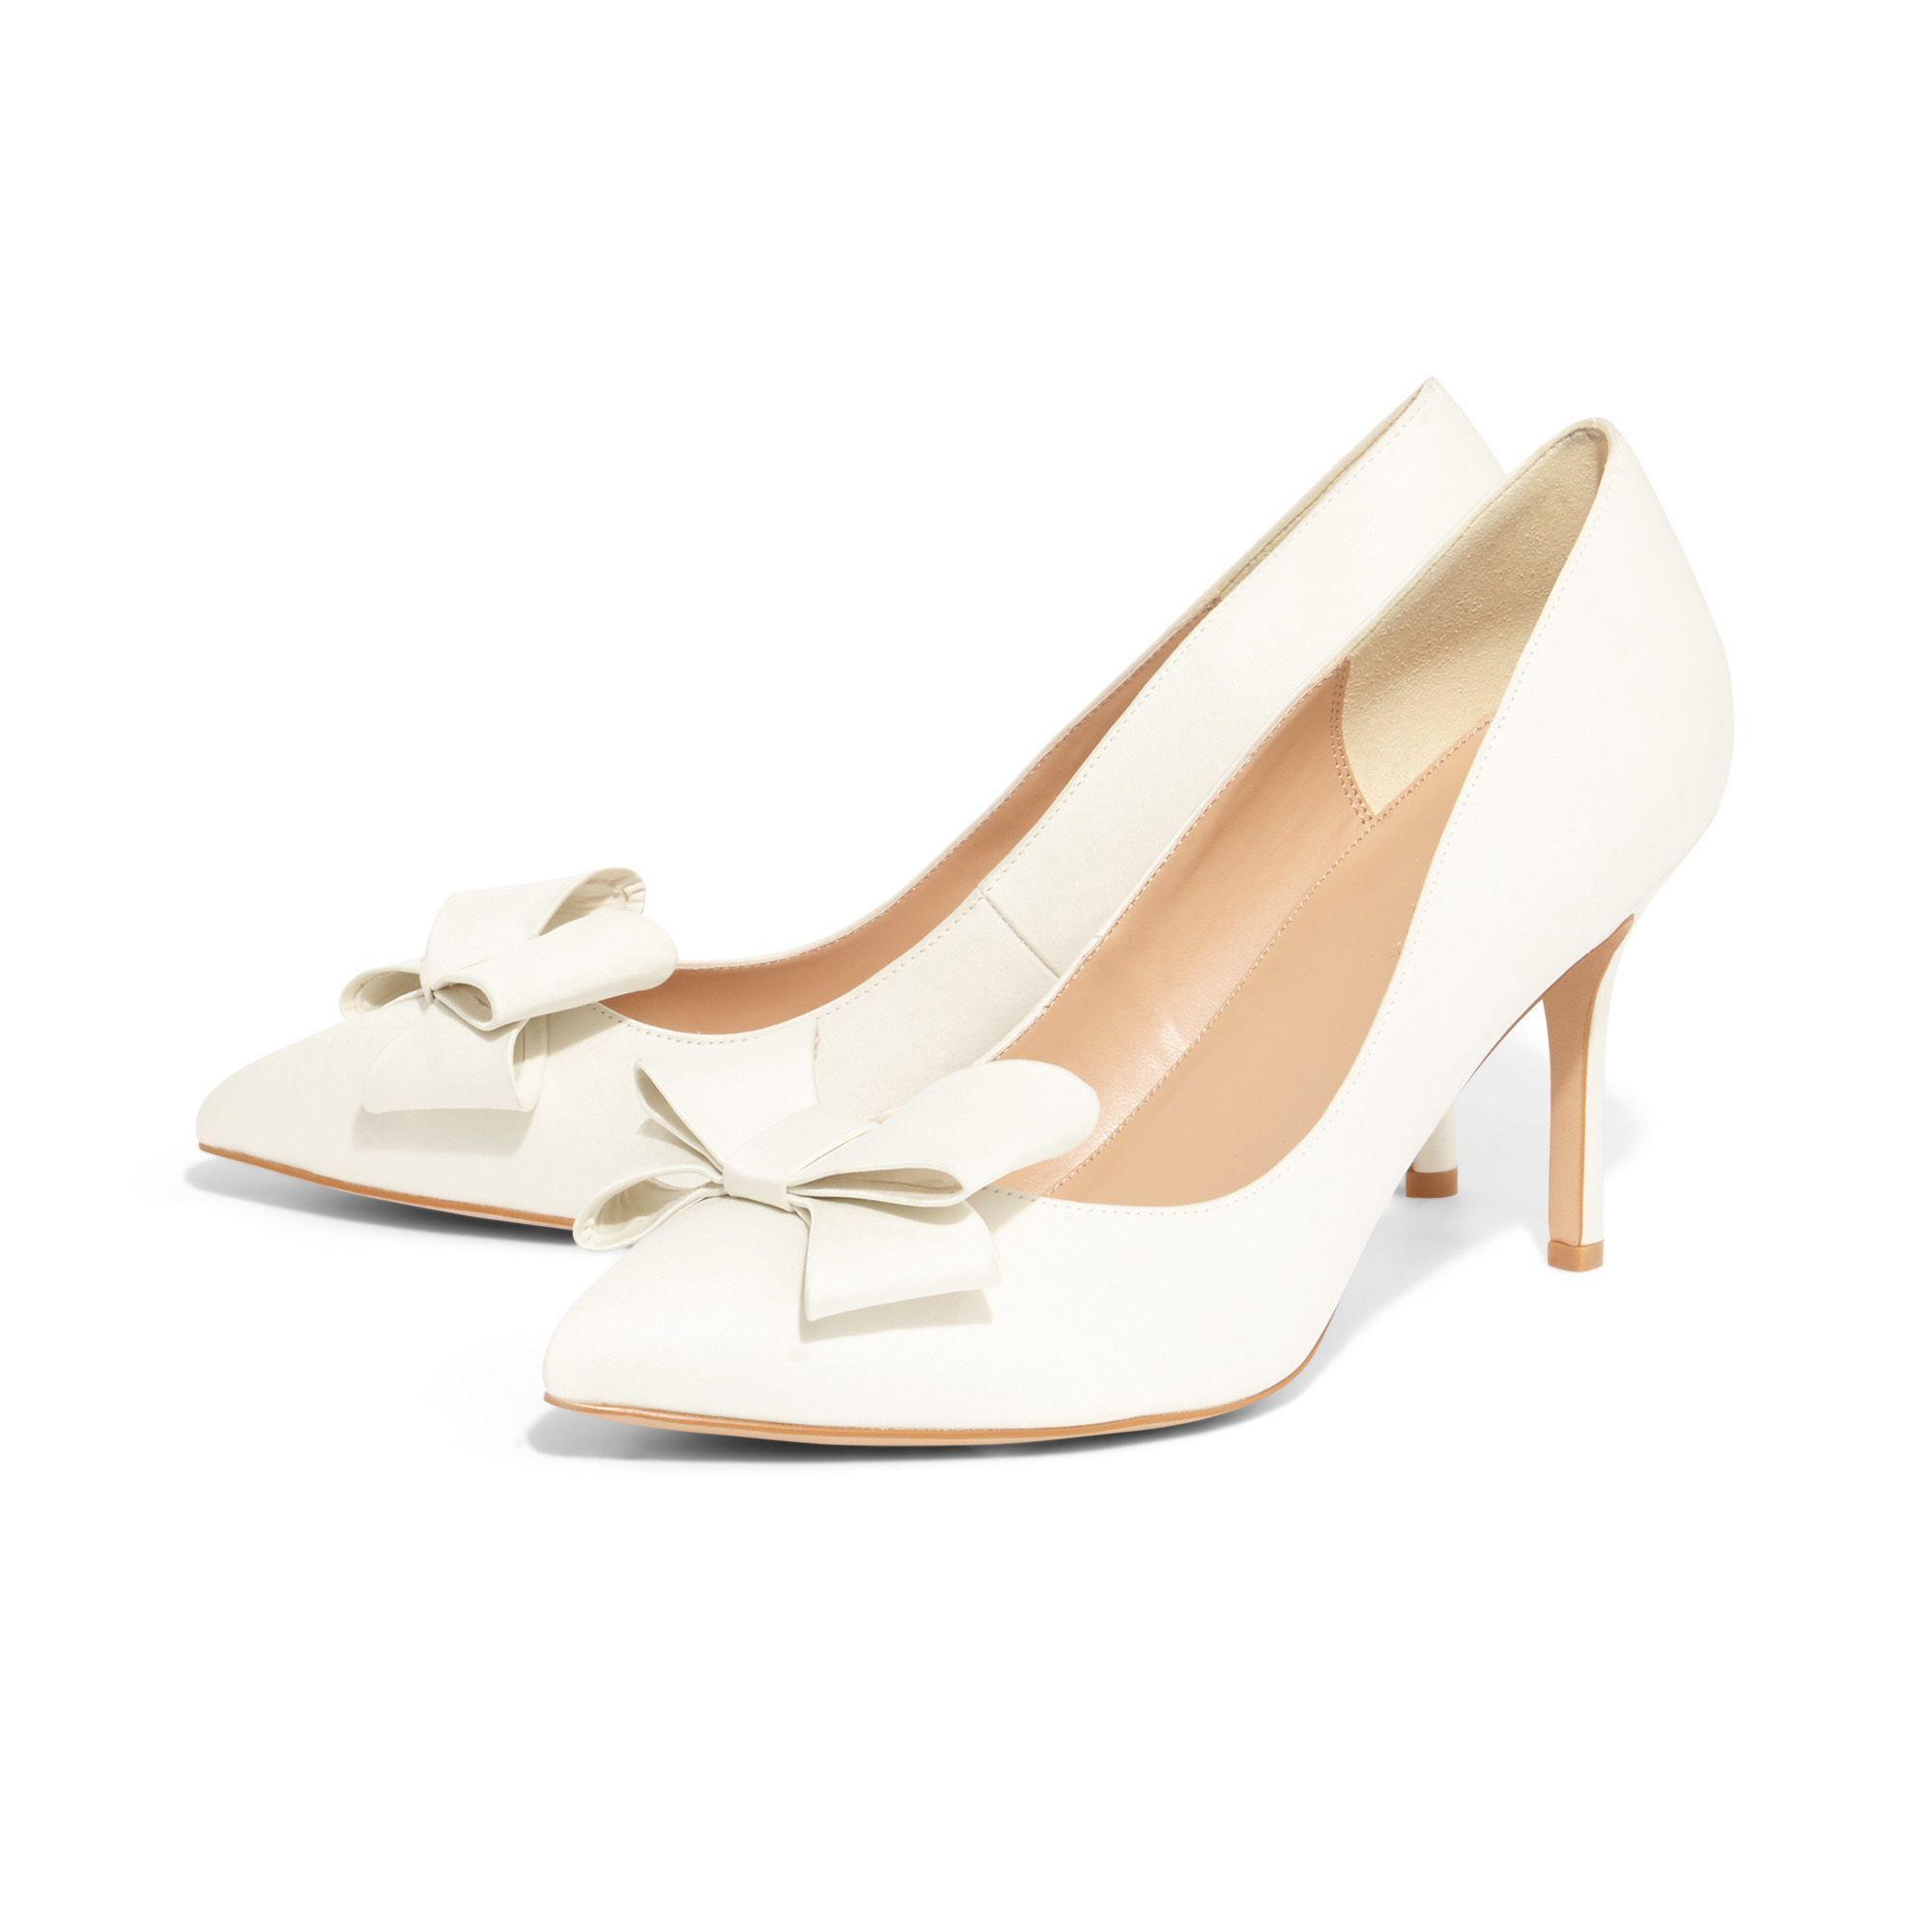 34c62fbc9cb Women's Natural Kara Satin Pointed Court Shoes